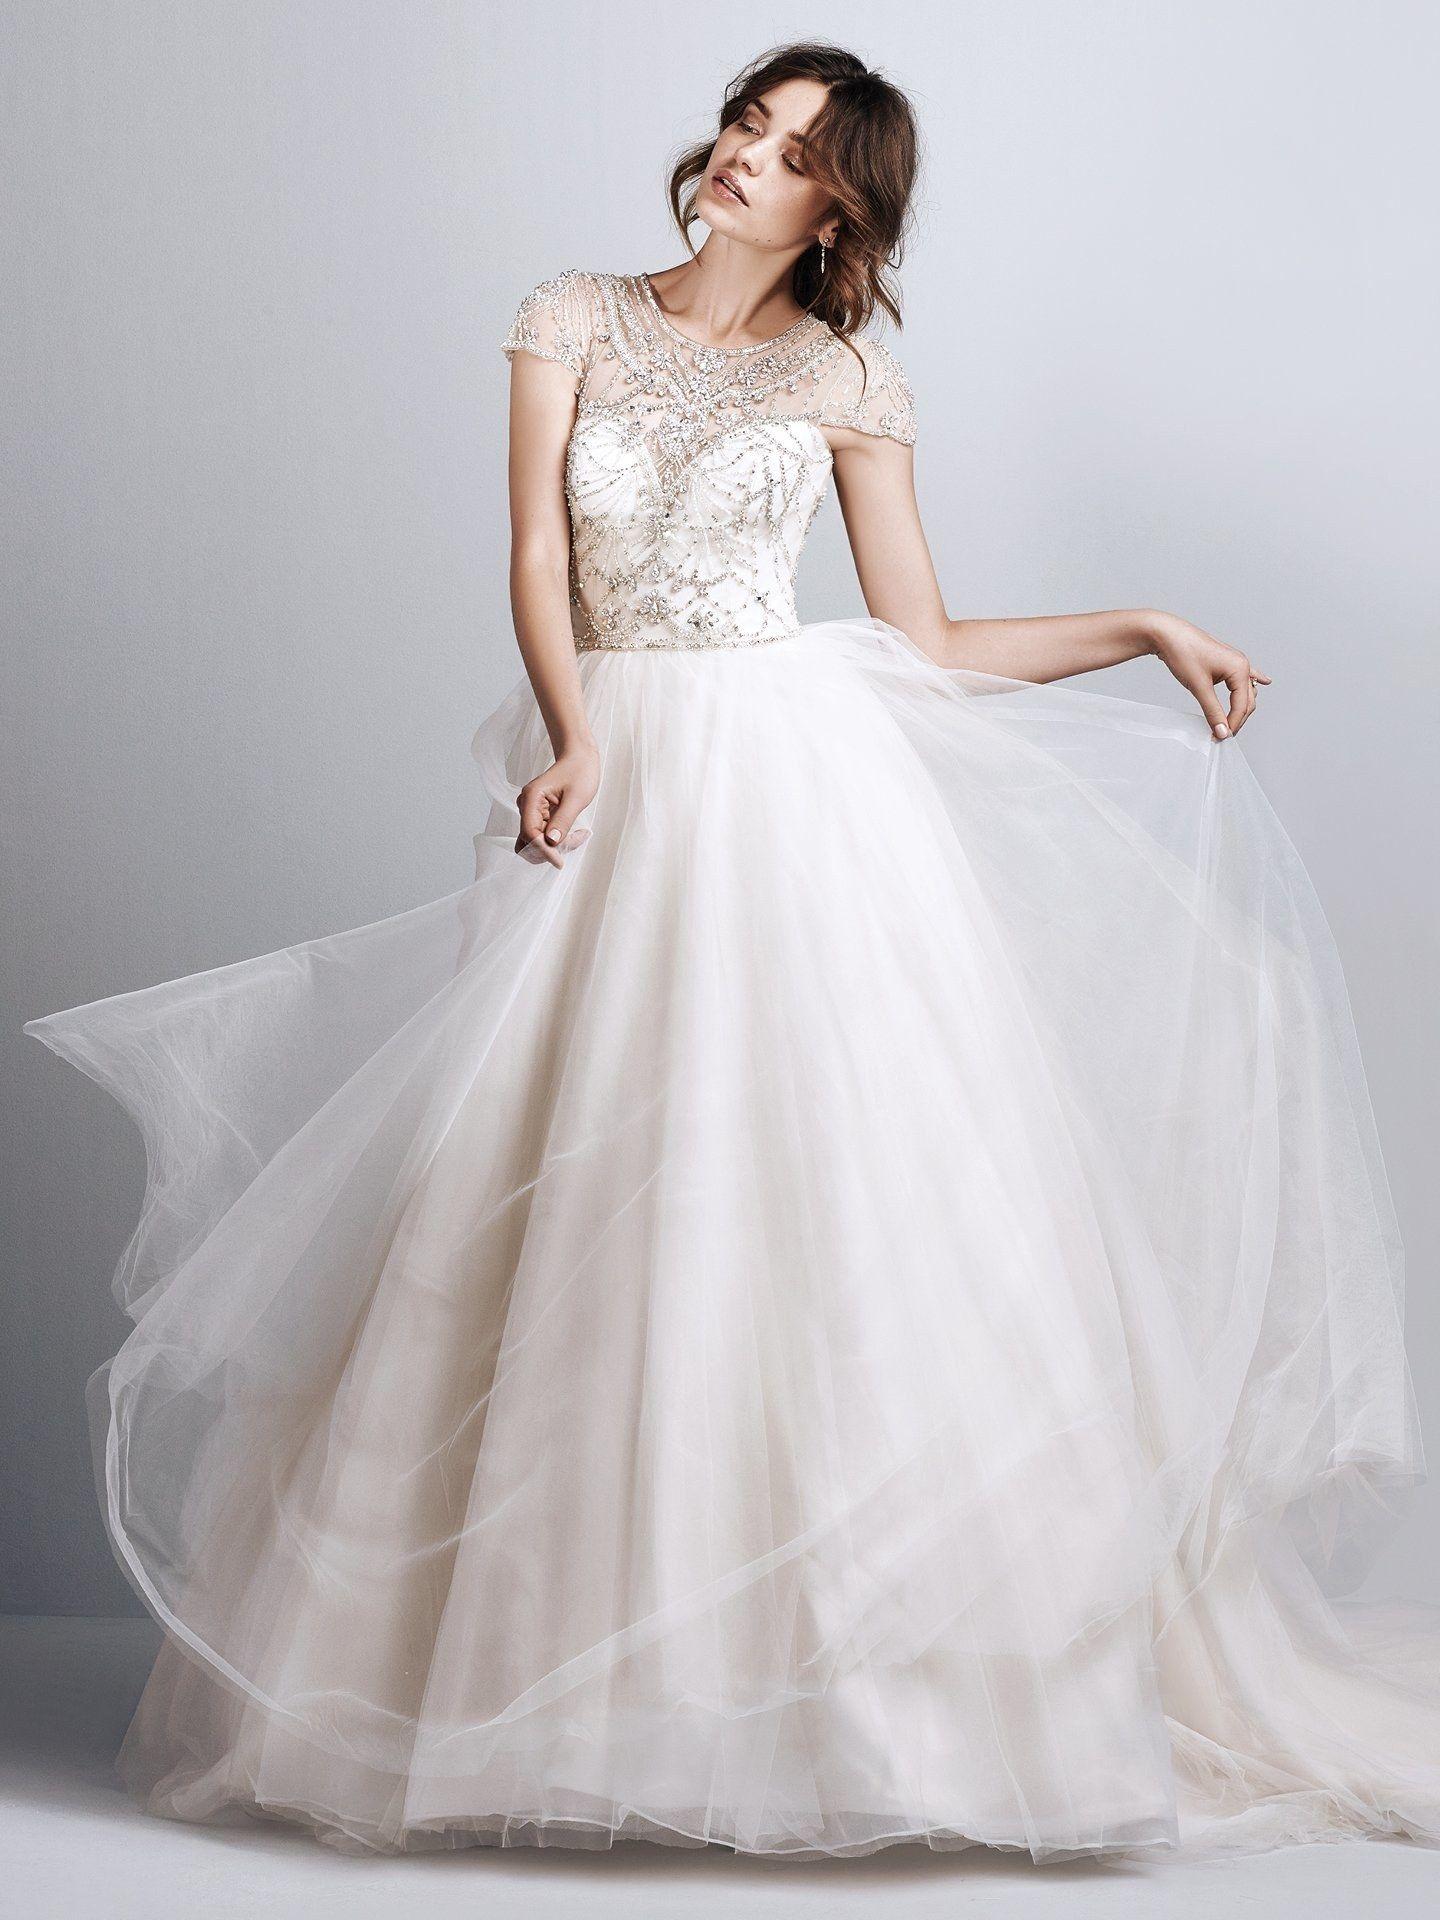 5959e62319 60 Best Wedding Dresses for Pear Shapes   Brides   Dresses   Wedding ...